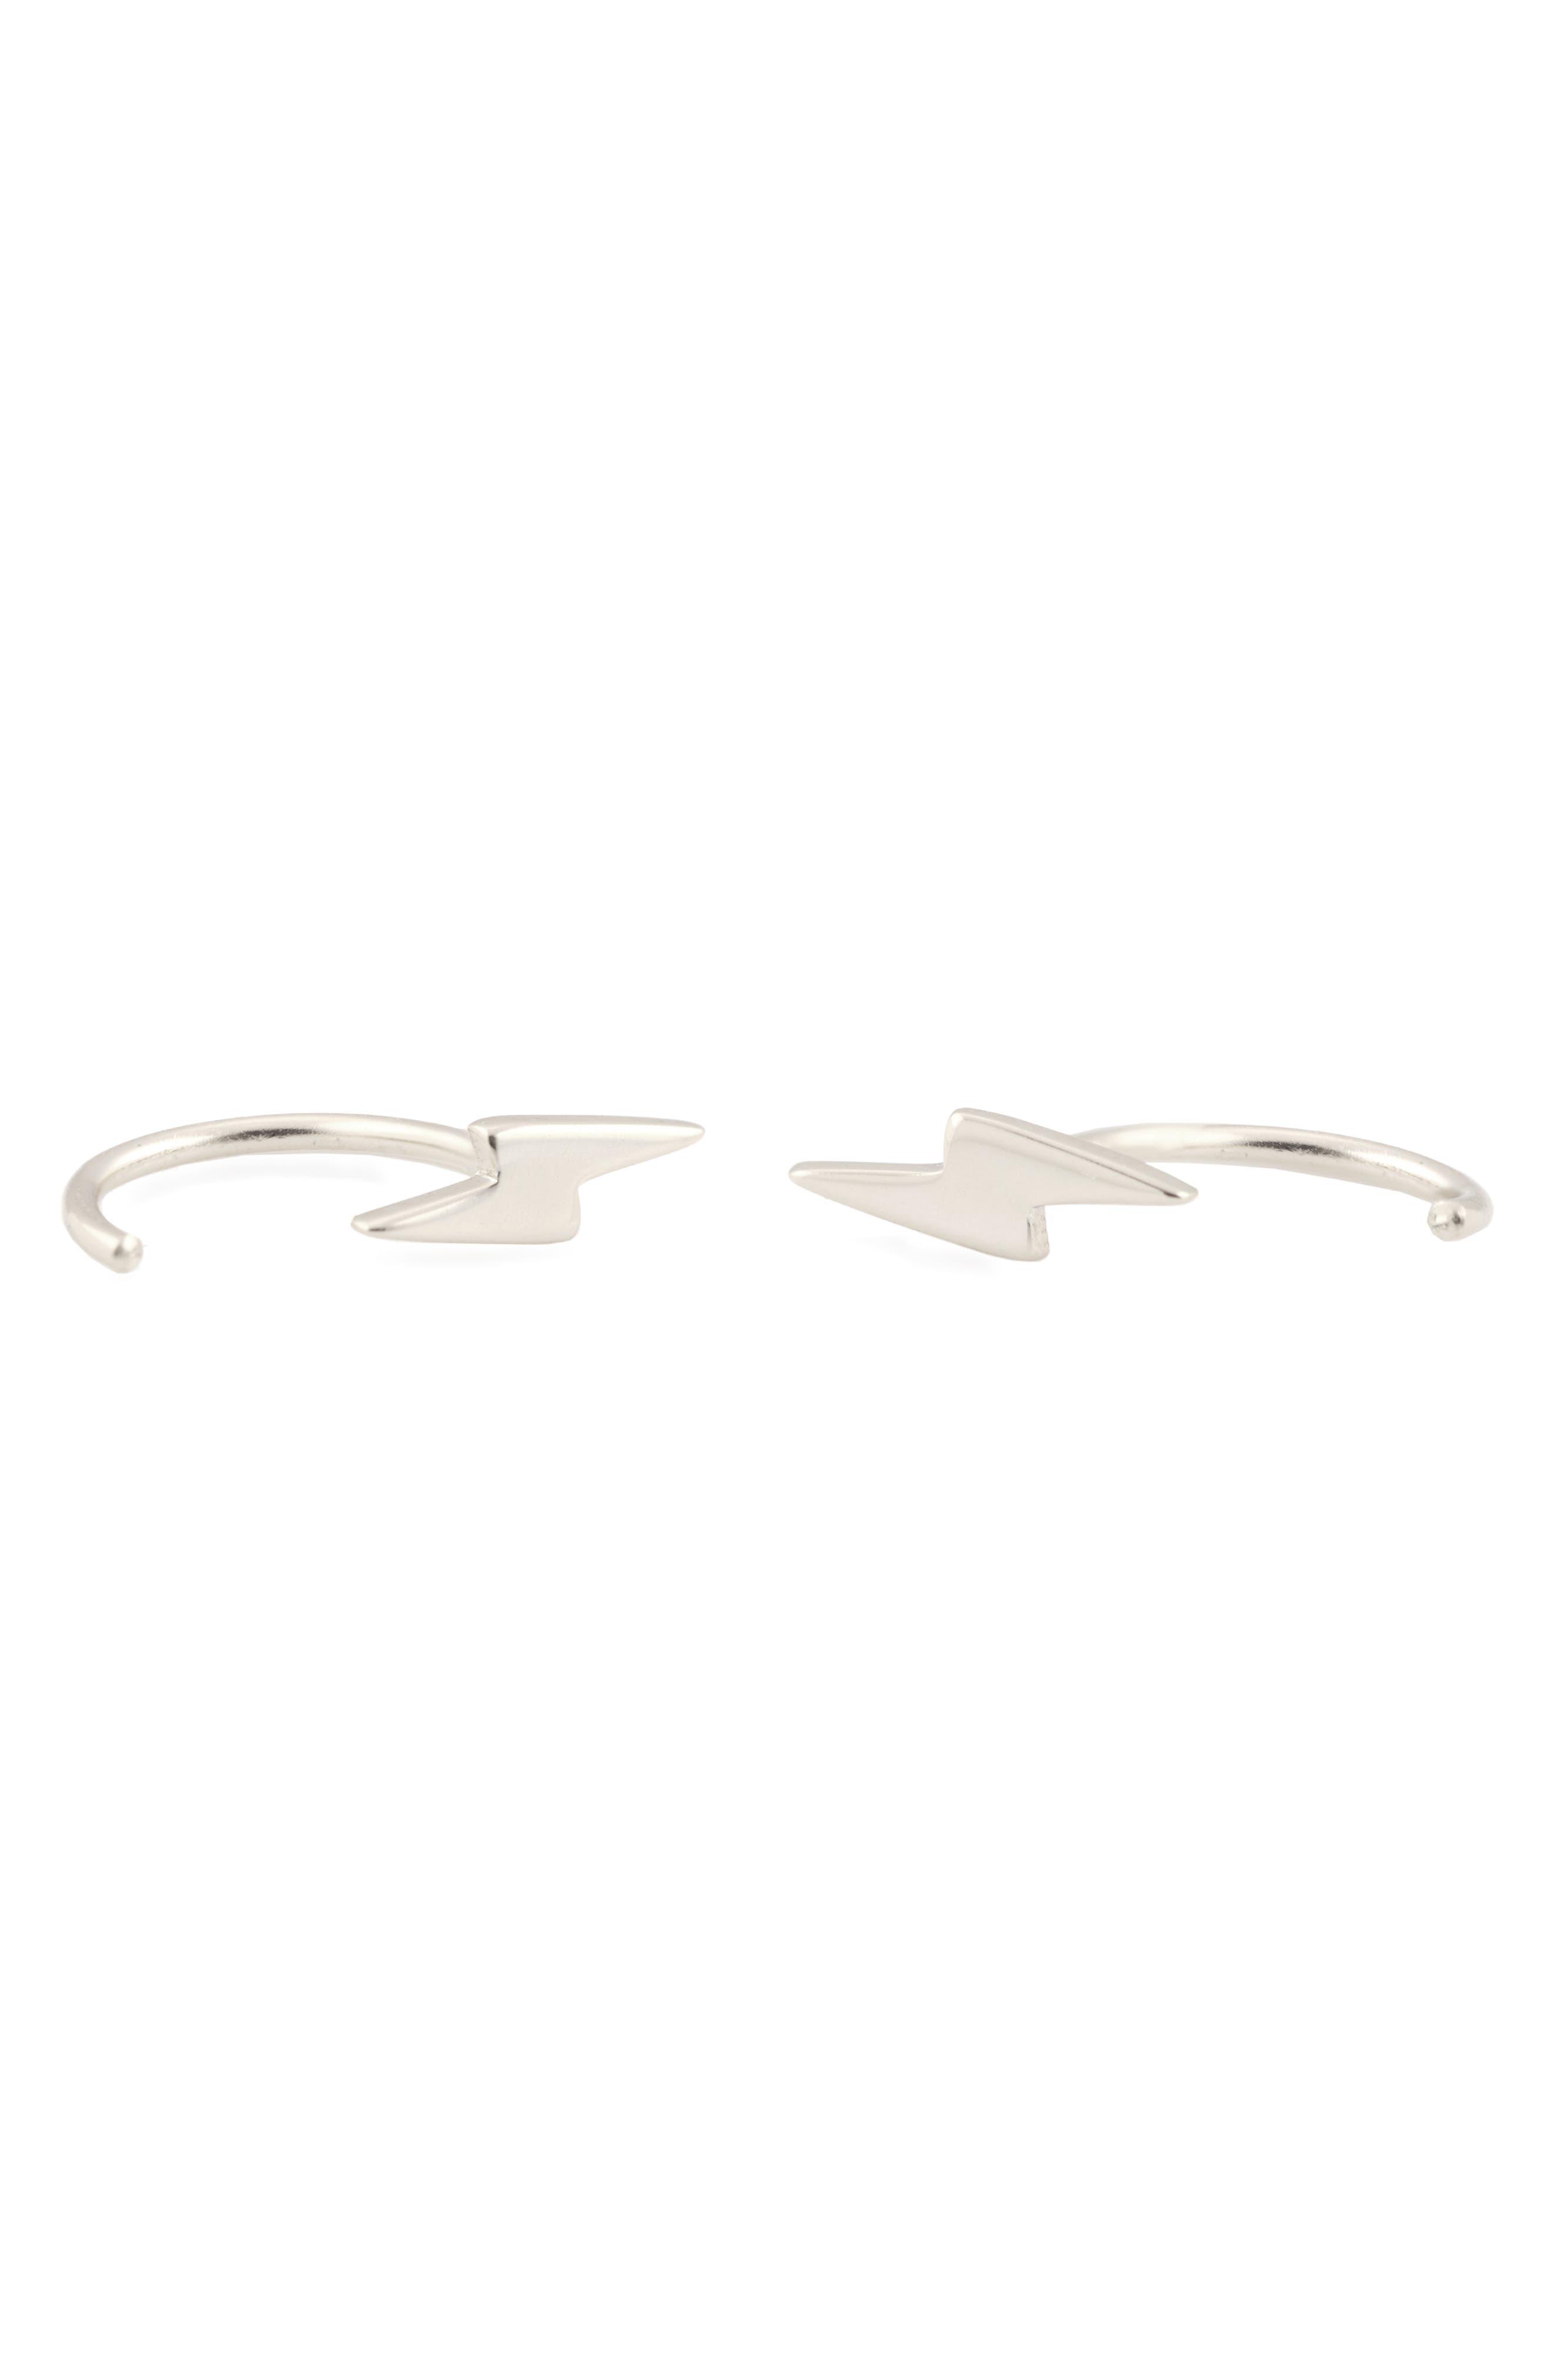 Tiny Lightning Stud Hoop Earrings,                         Main,                         color, SILVER